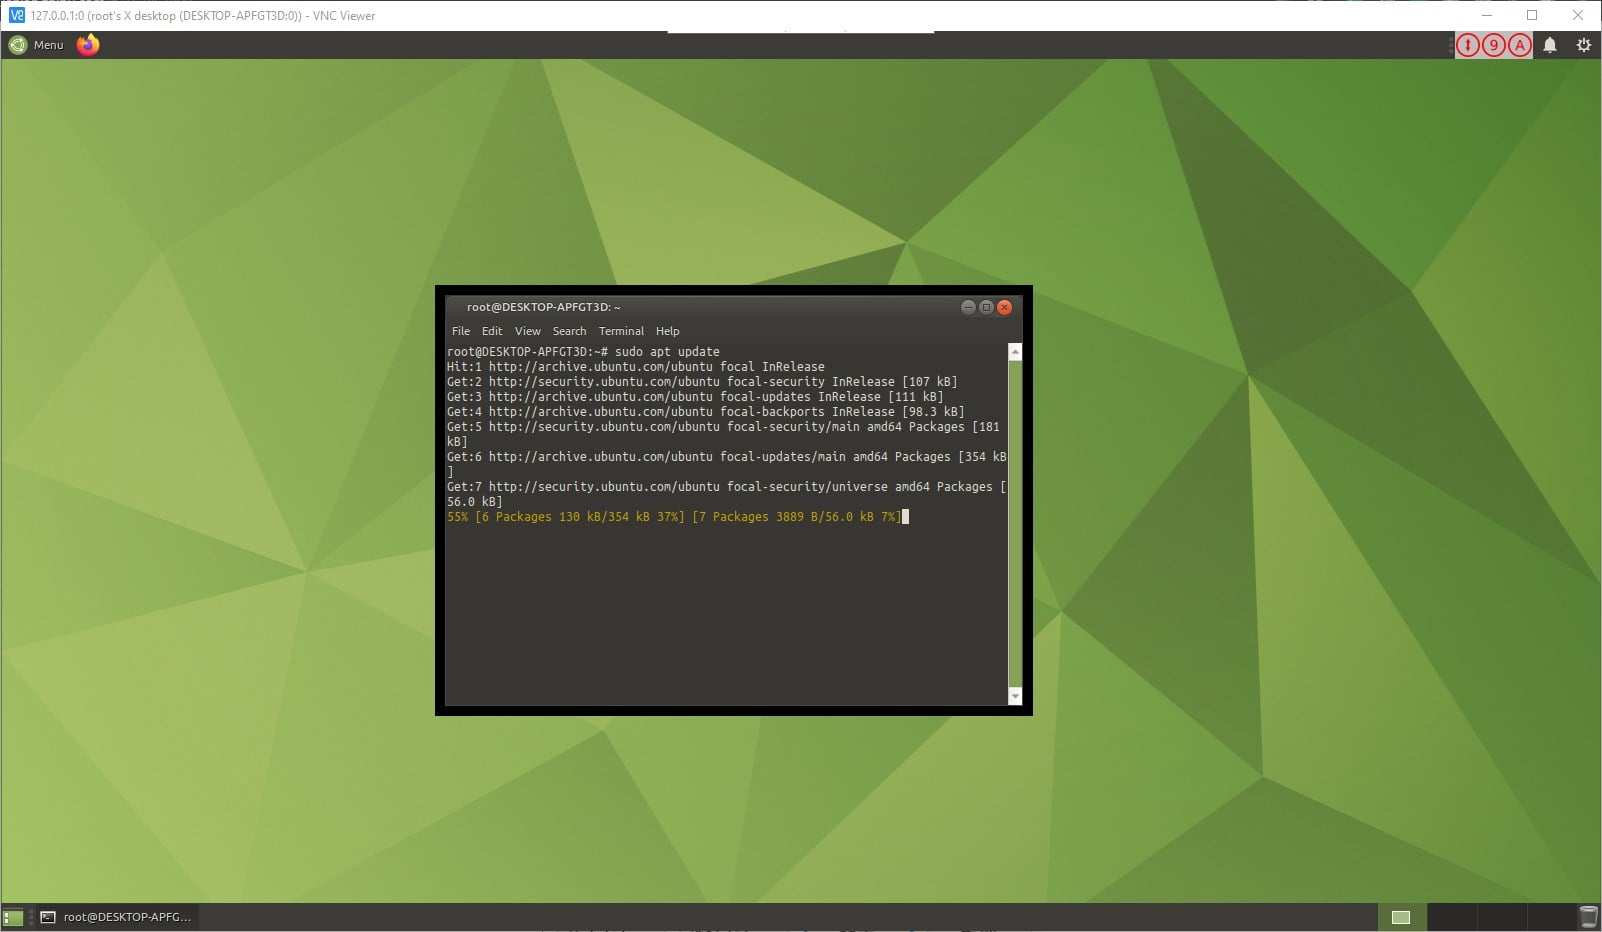 WSL Ubuntu 20.04 GUI desktop running terminal